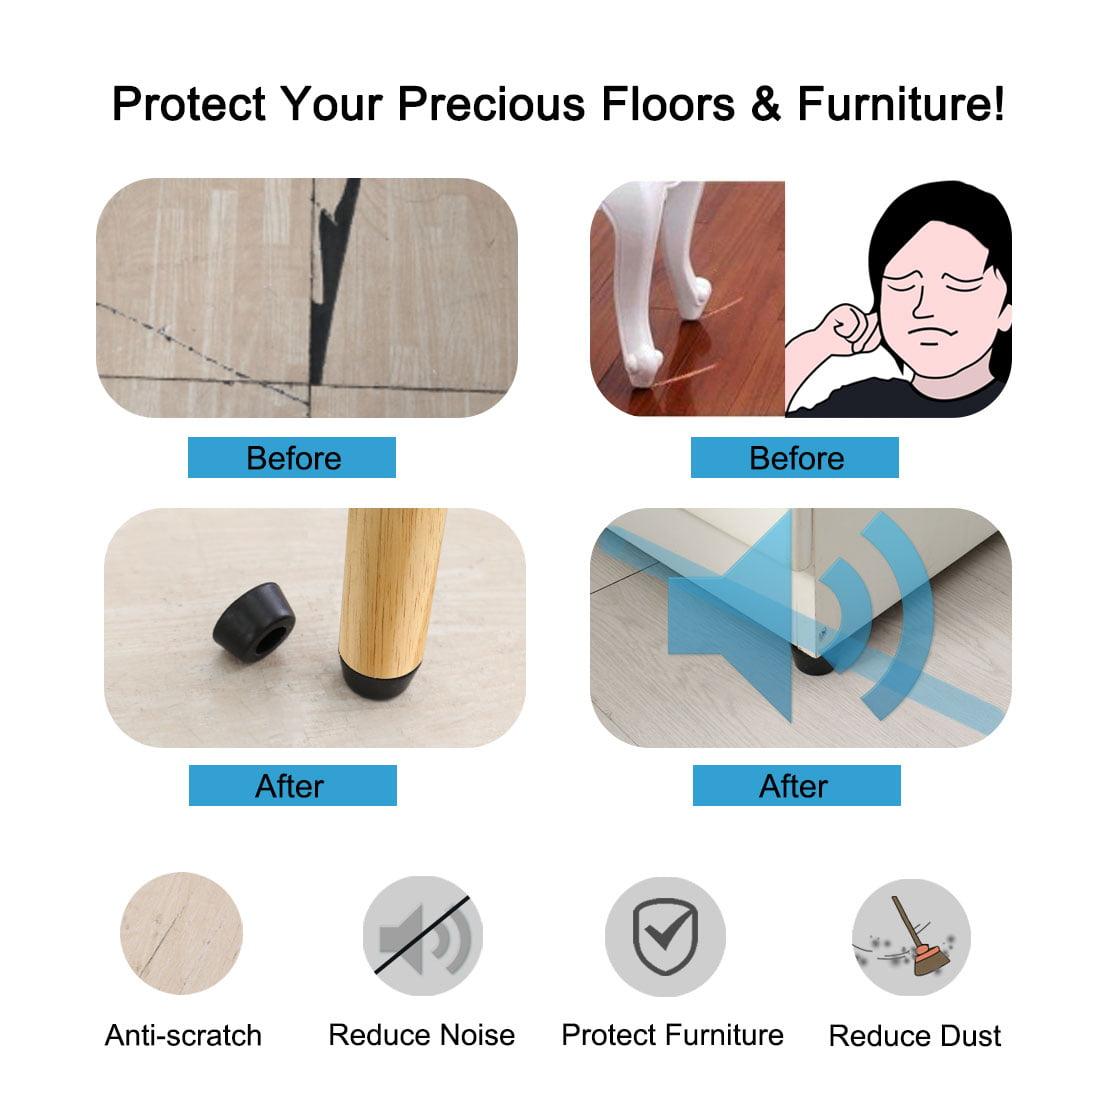 24pcs Rubber Feet Bumpers Buffer Chair Leg Pad with Metal Washer, D25x21xH13mm - image 3 de 7